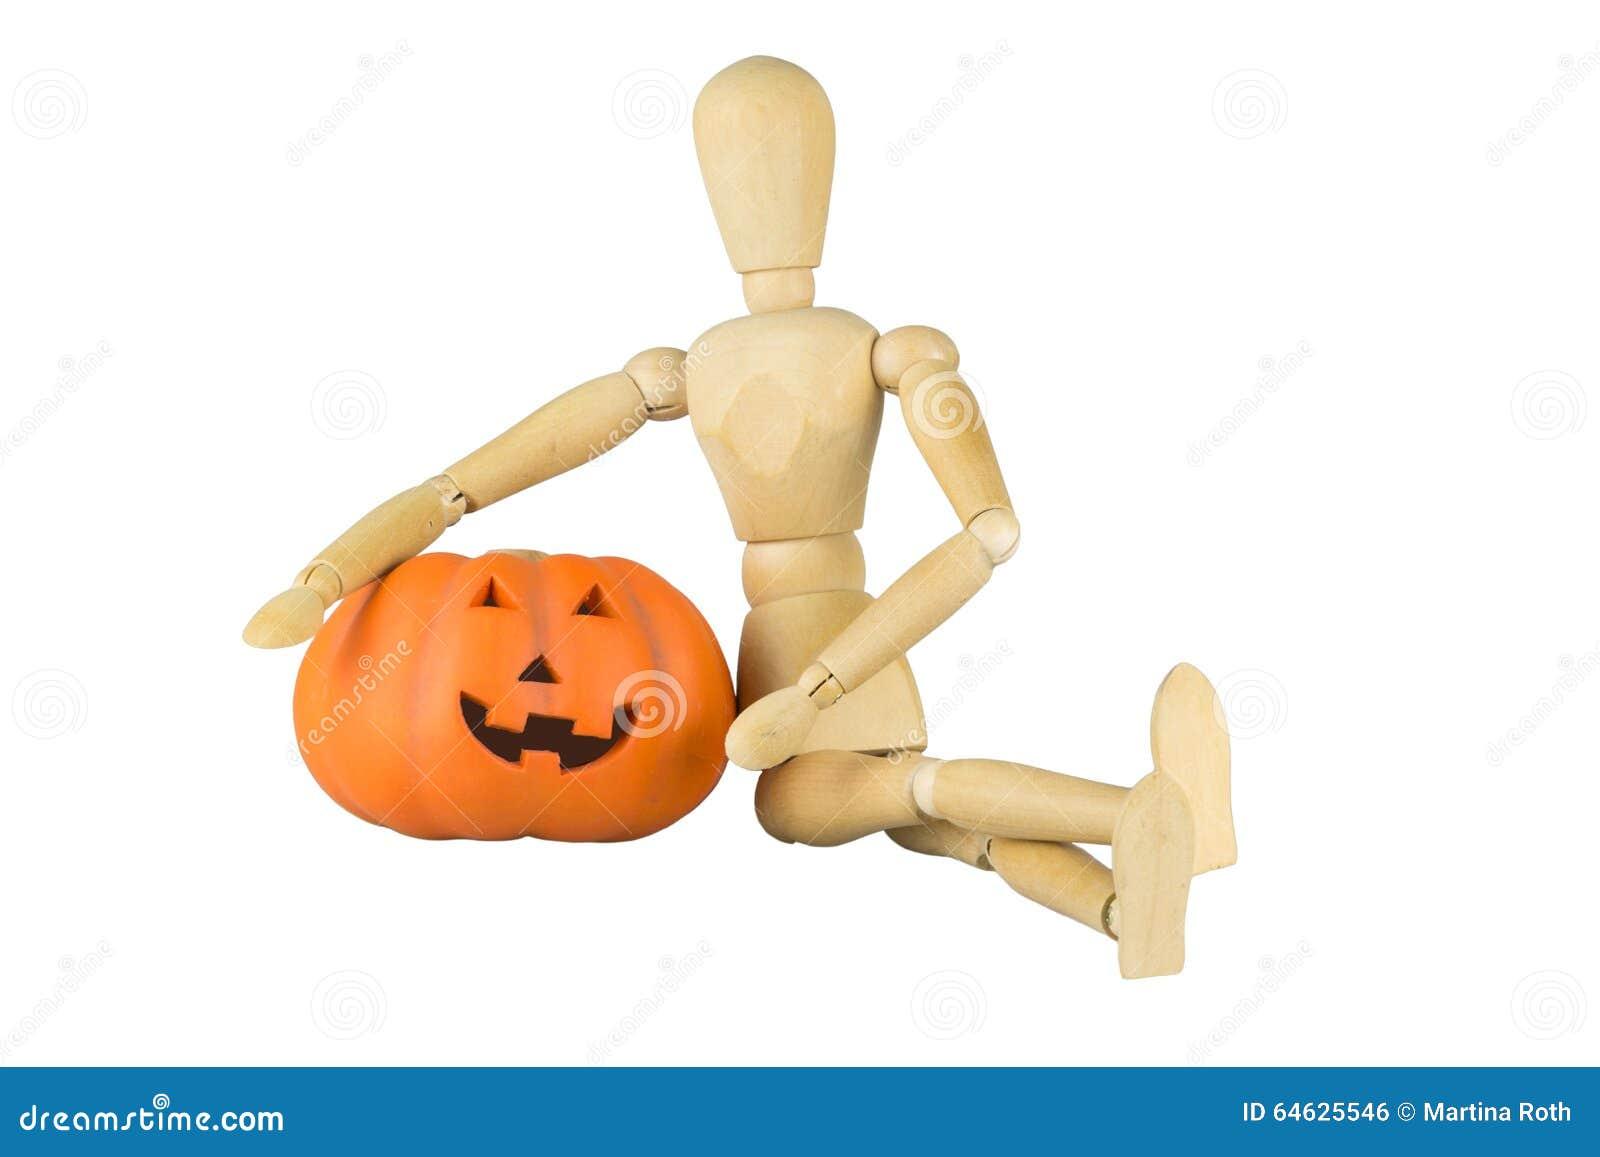 Wooden mannequin posing with a pumpkin